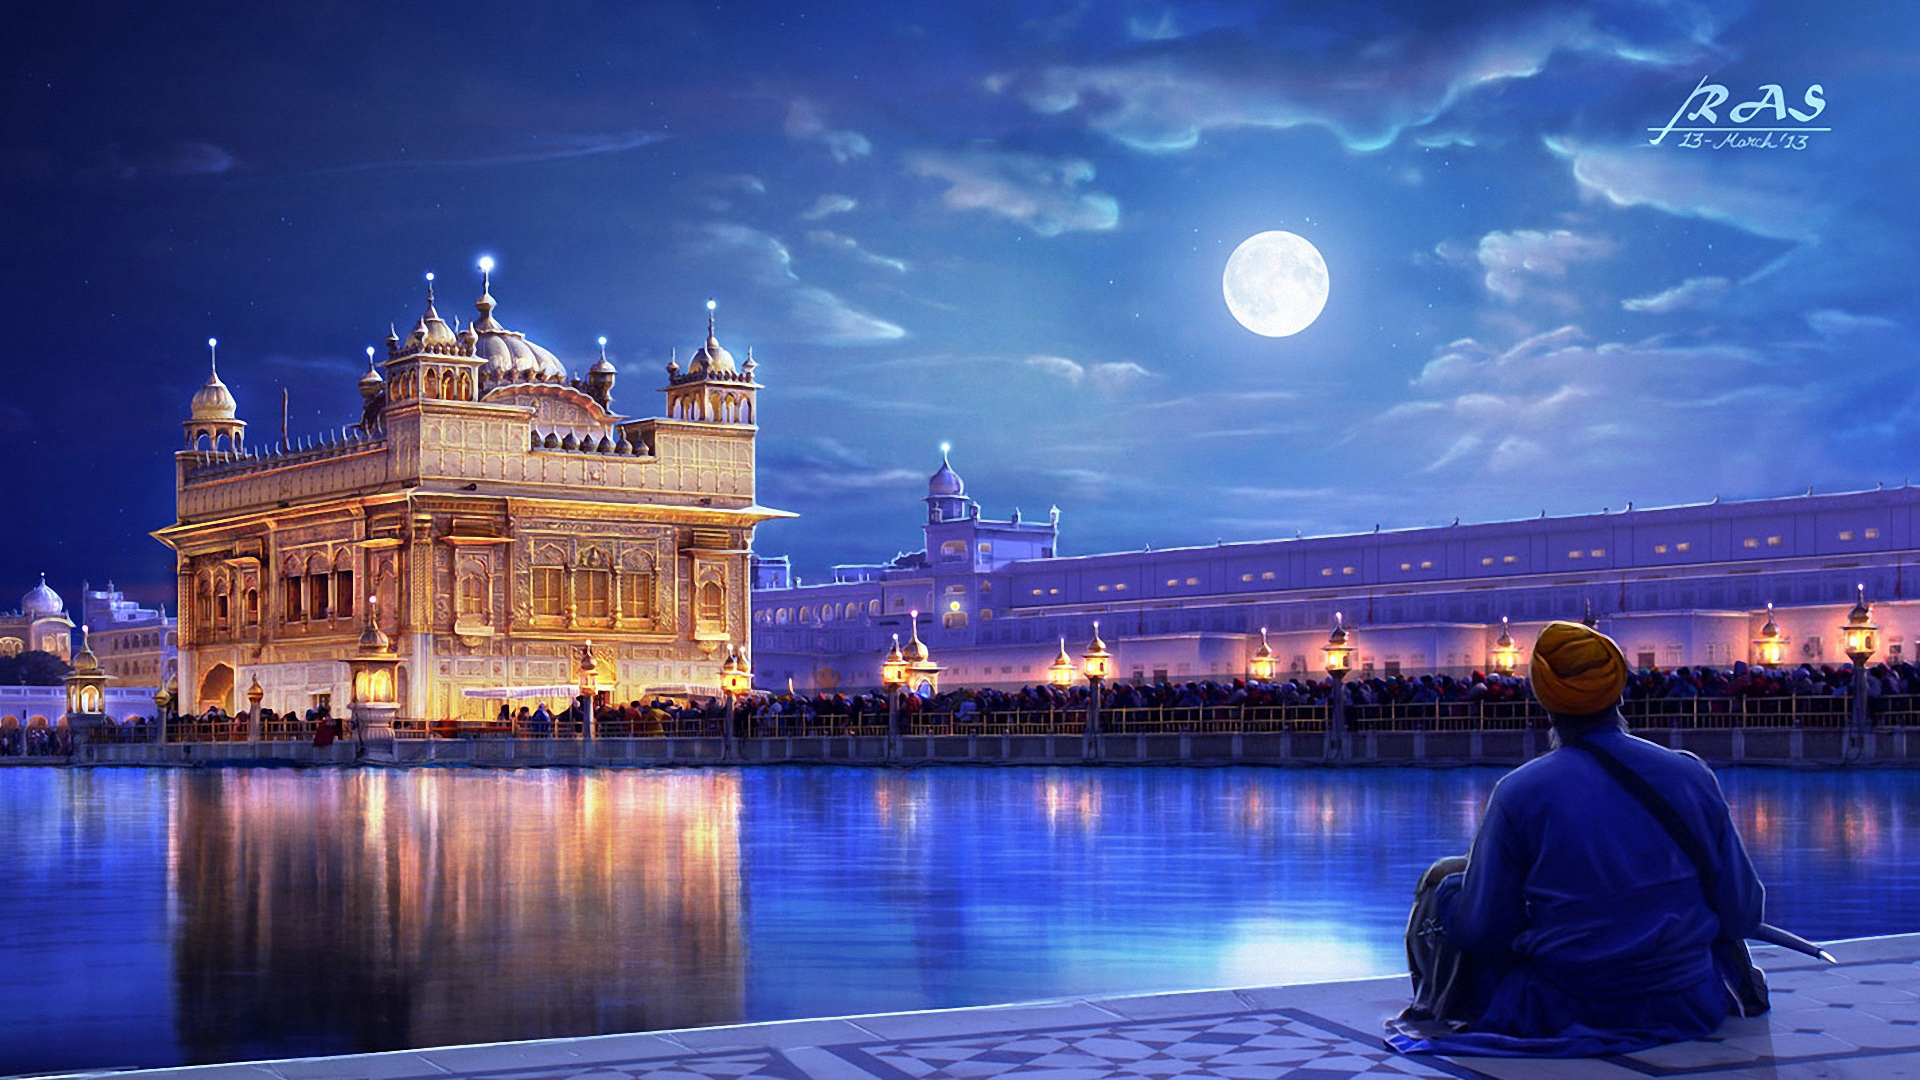 Hd wallpaper india - Golden Temple Amritsar Punjab India Wallpapers Hd Wallpapers